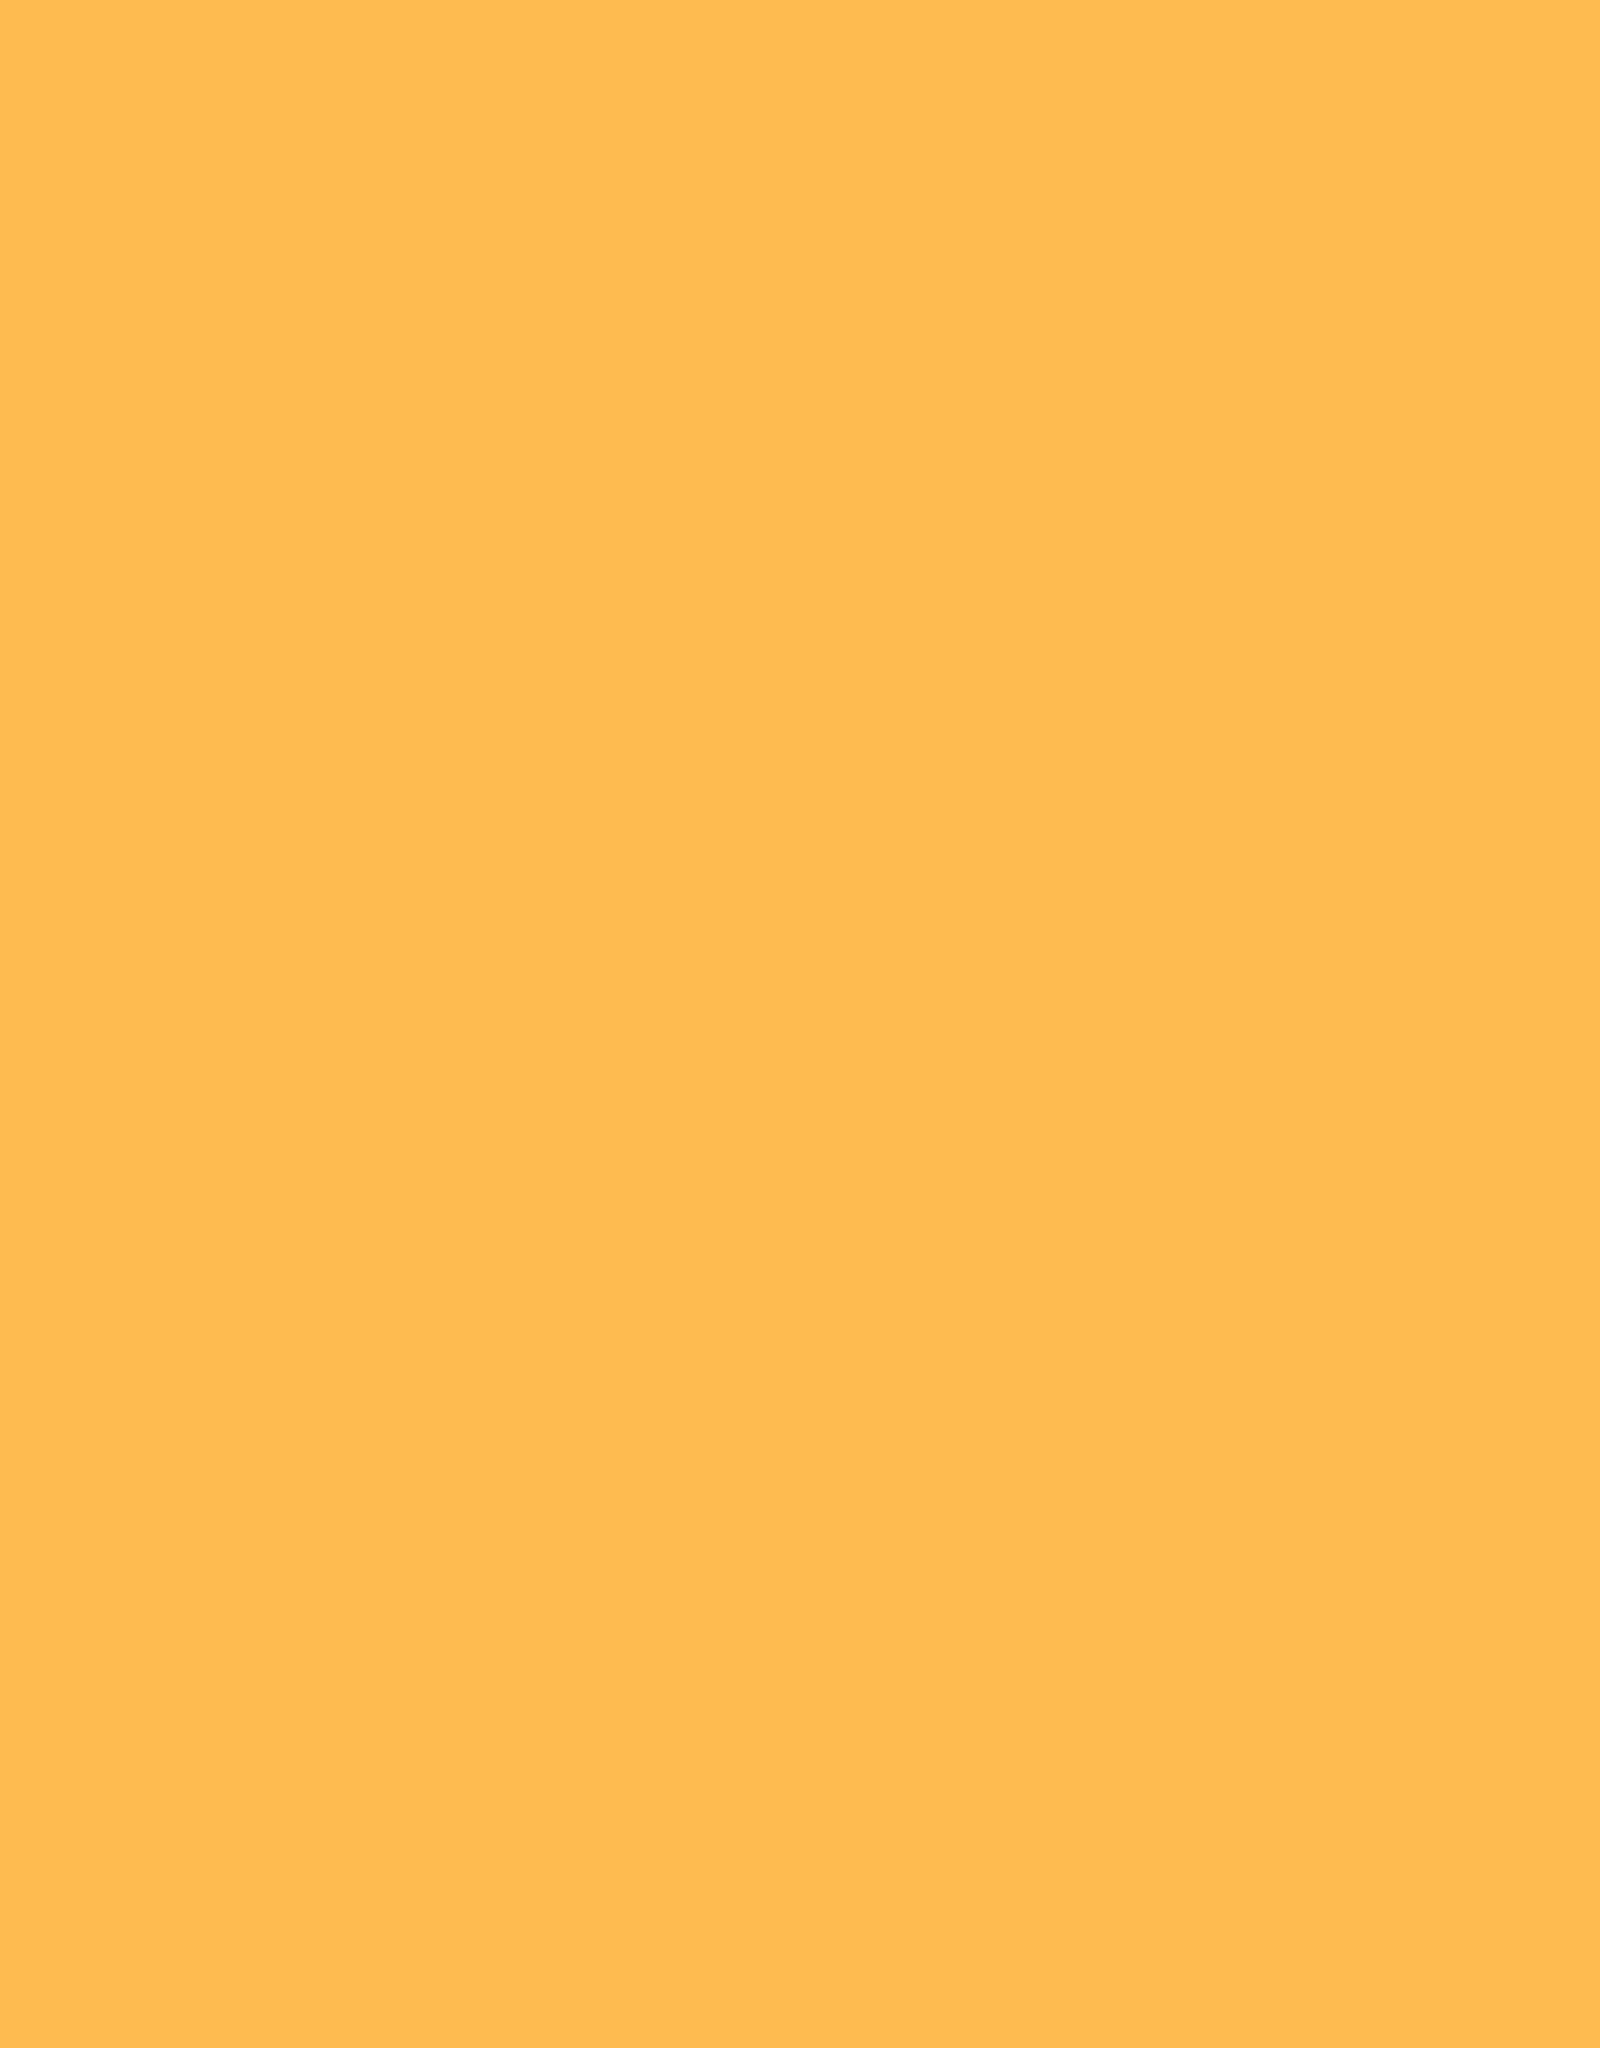 Sennelier, Extra Fine Soft Pastel, Bright Yellow